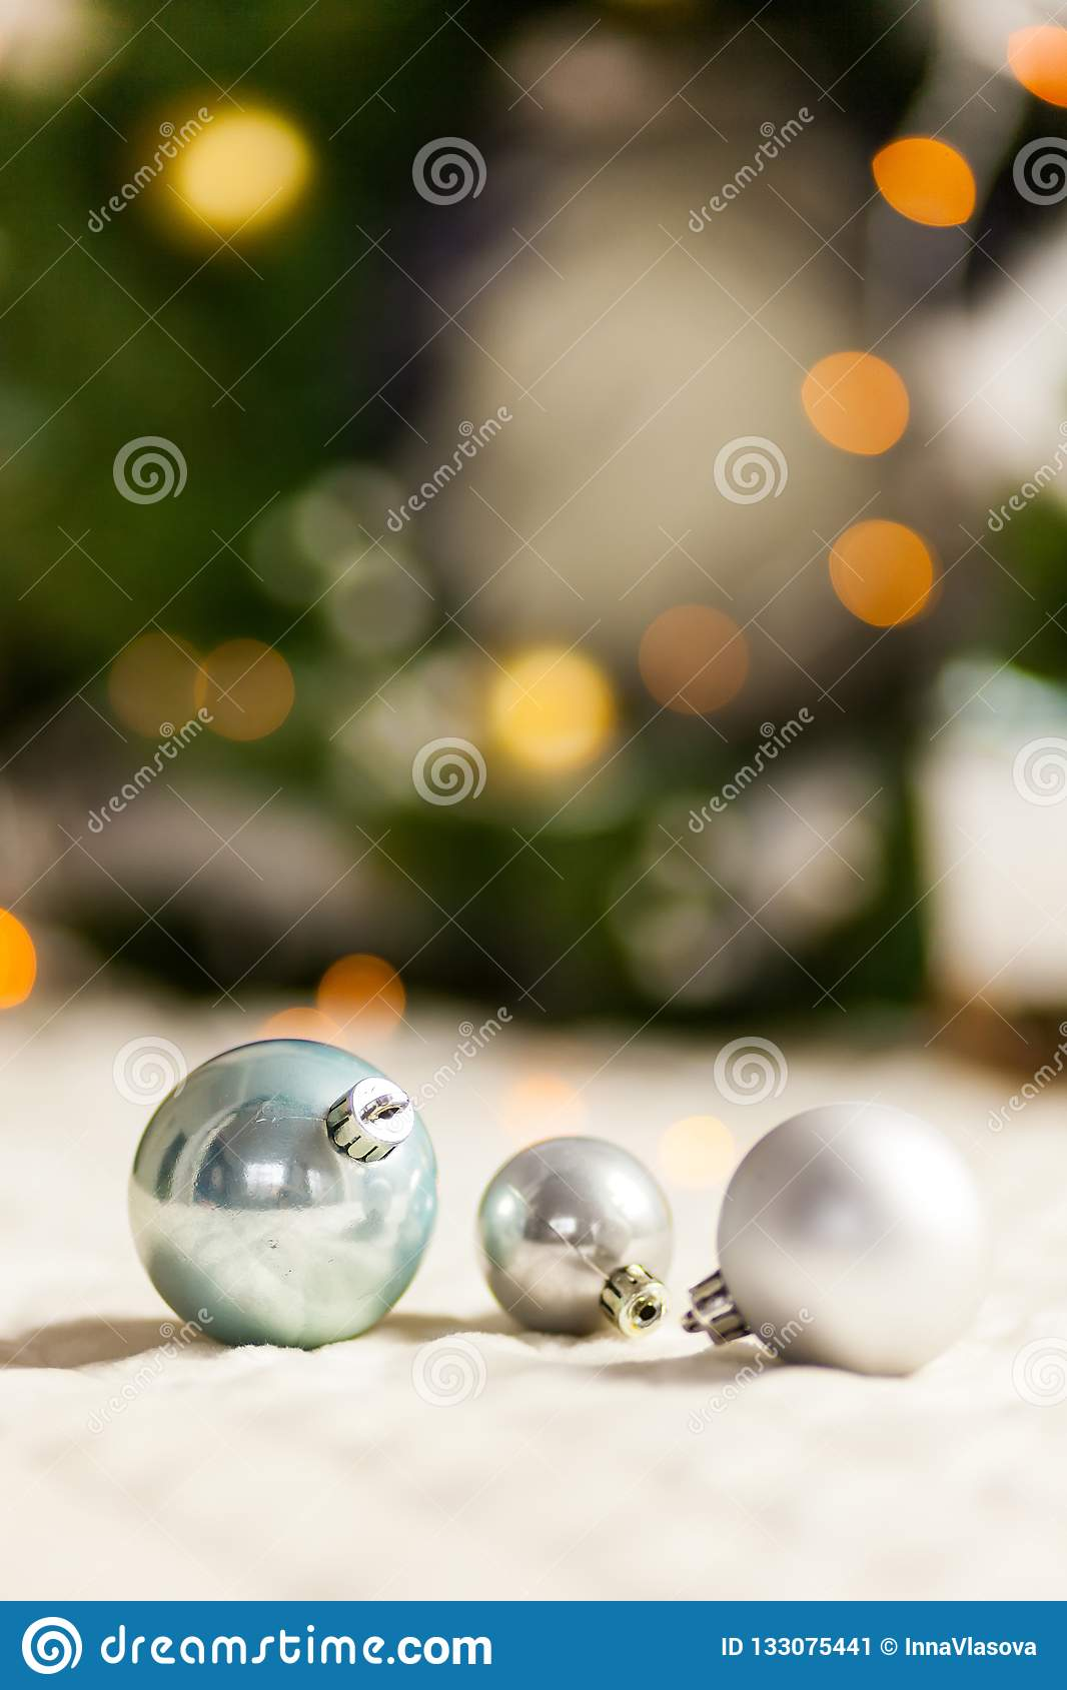 Three Pearl Christmas balls with colorful bokeh